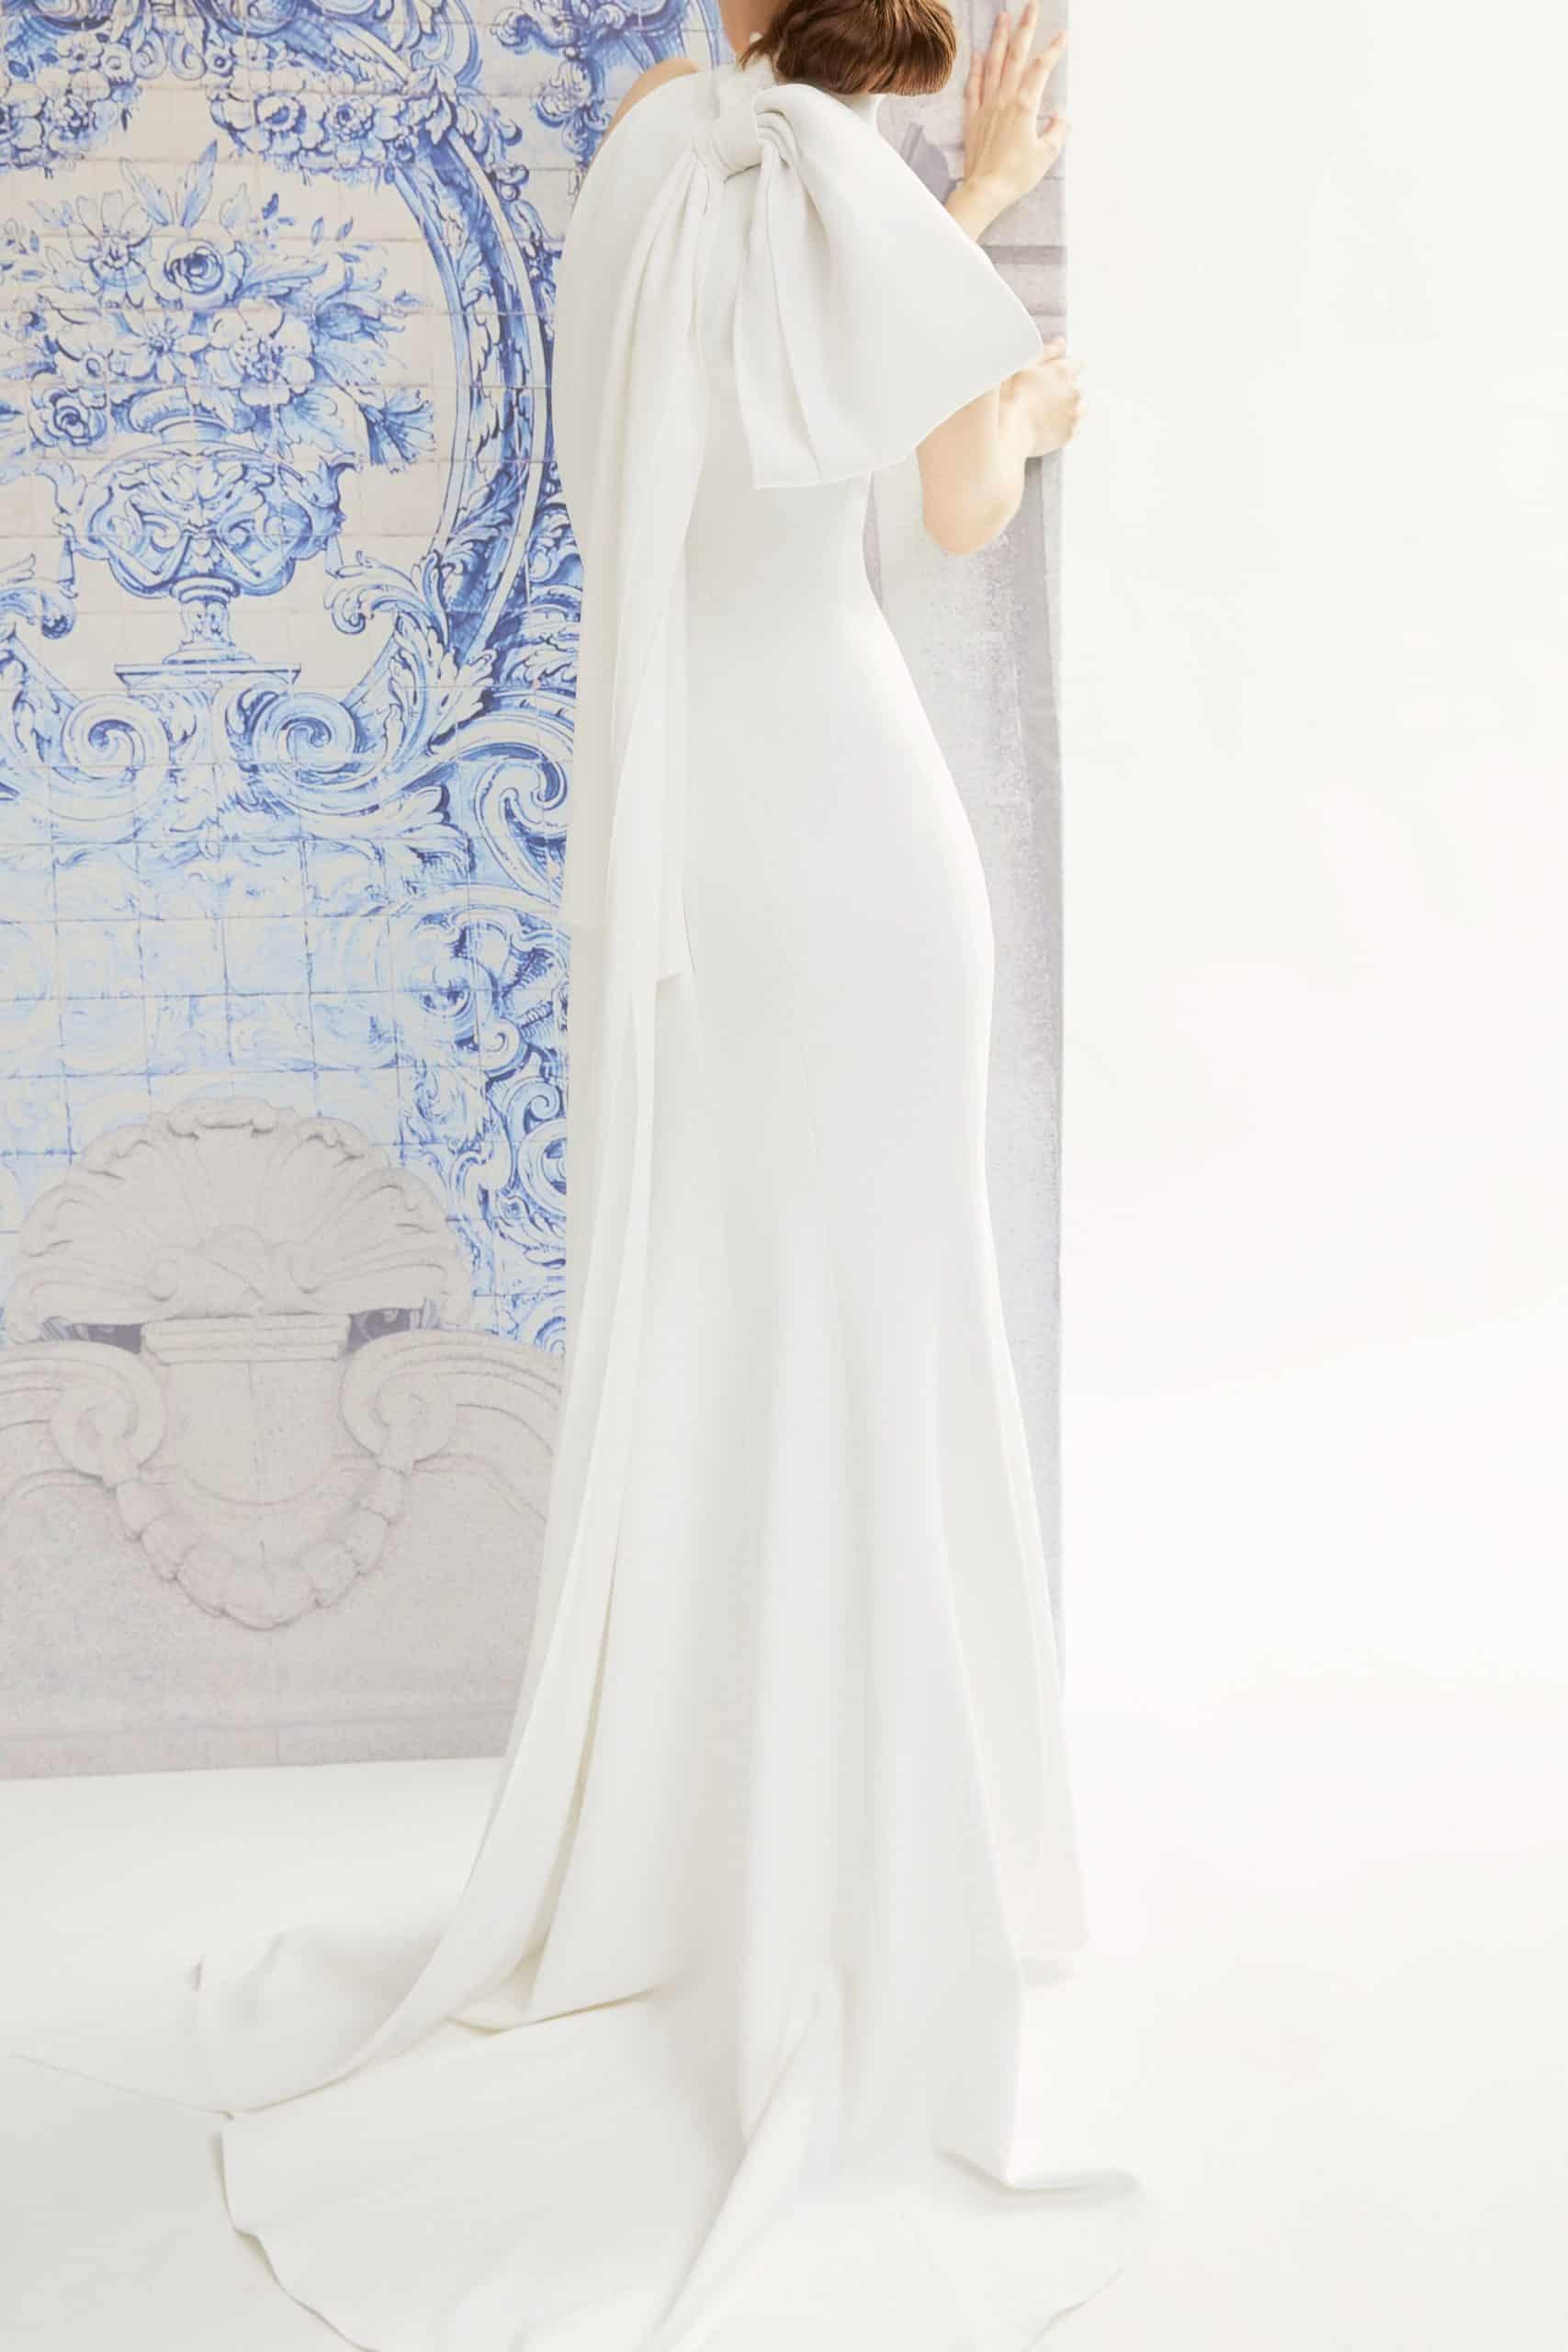 wedding dress with back bow fall 2019 by Carolina Herrera